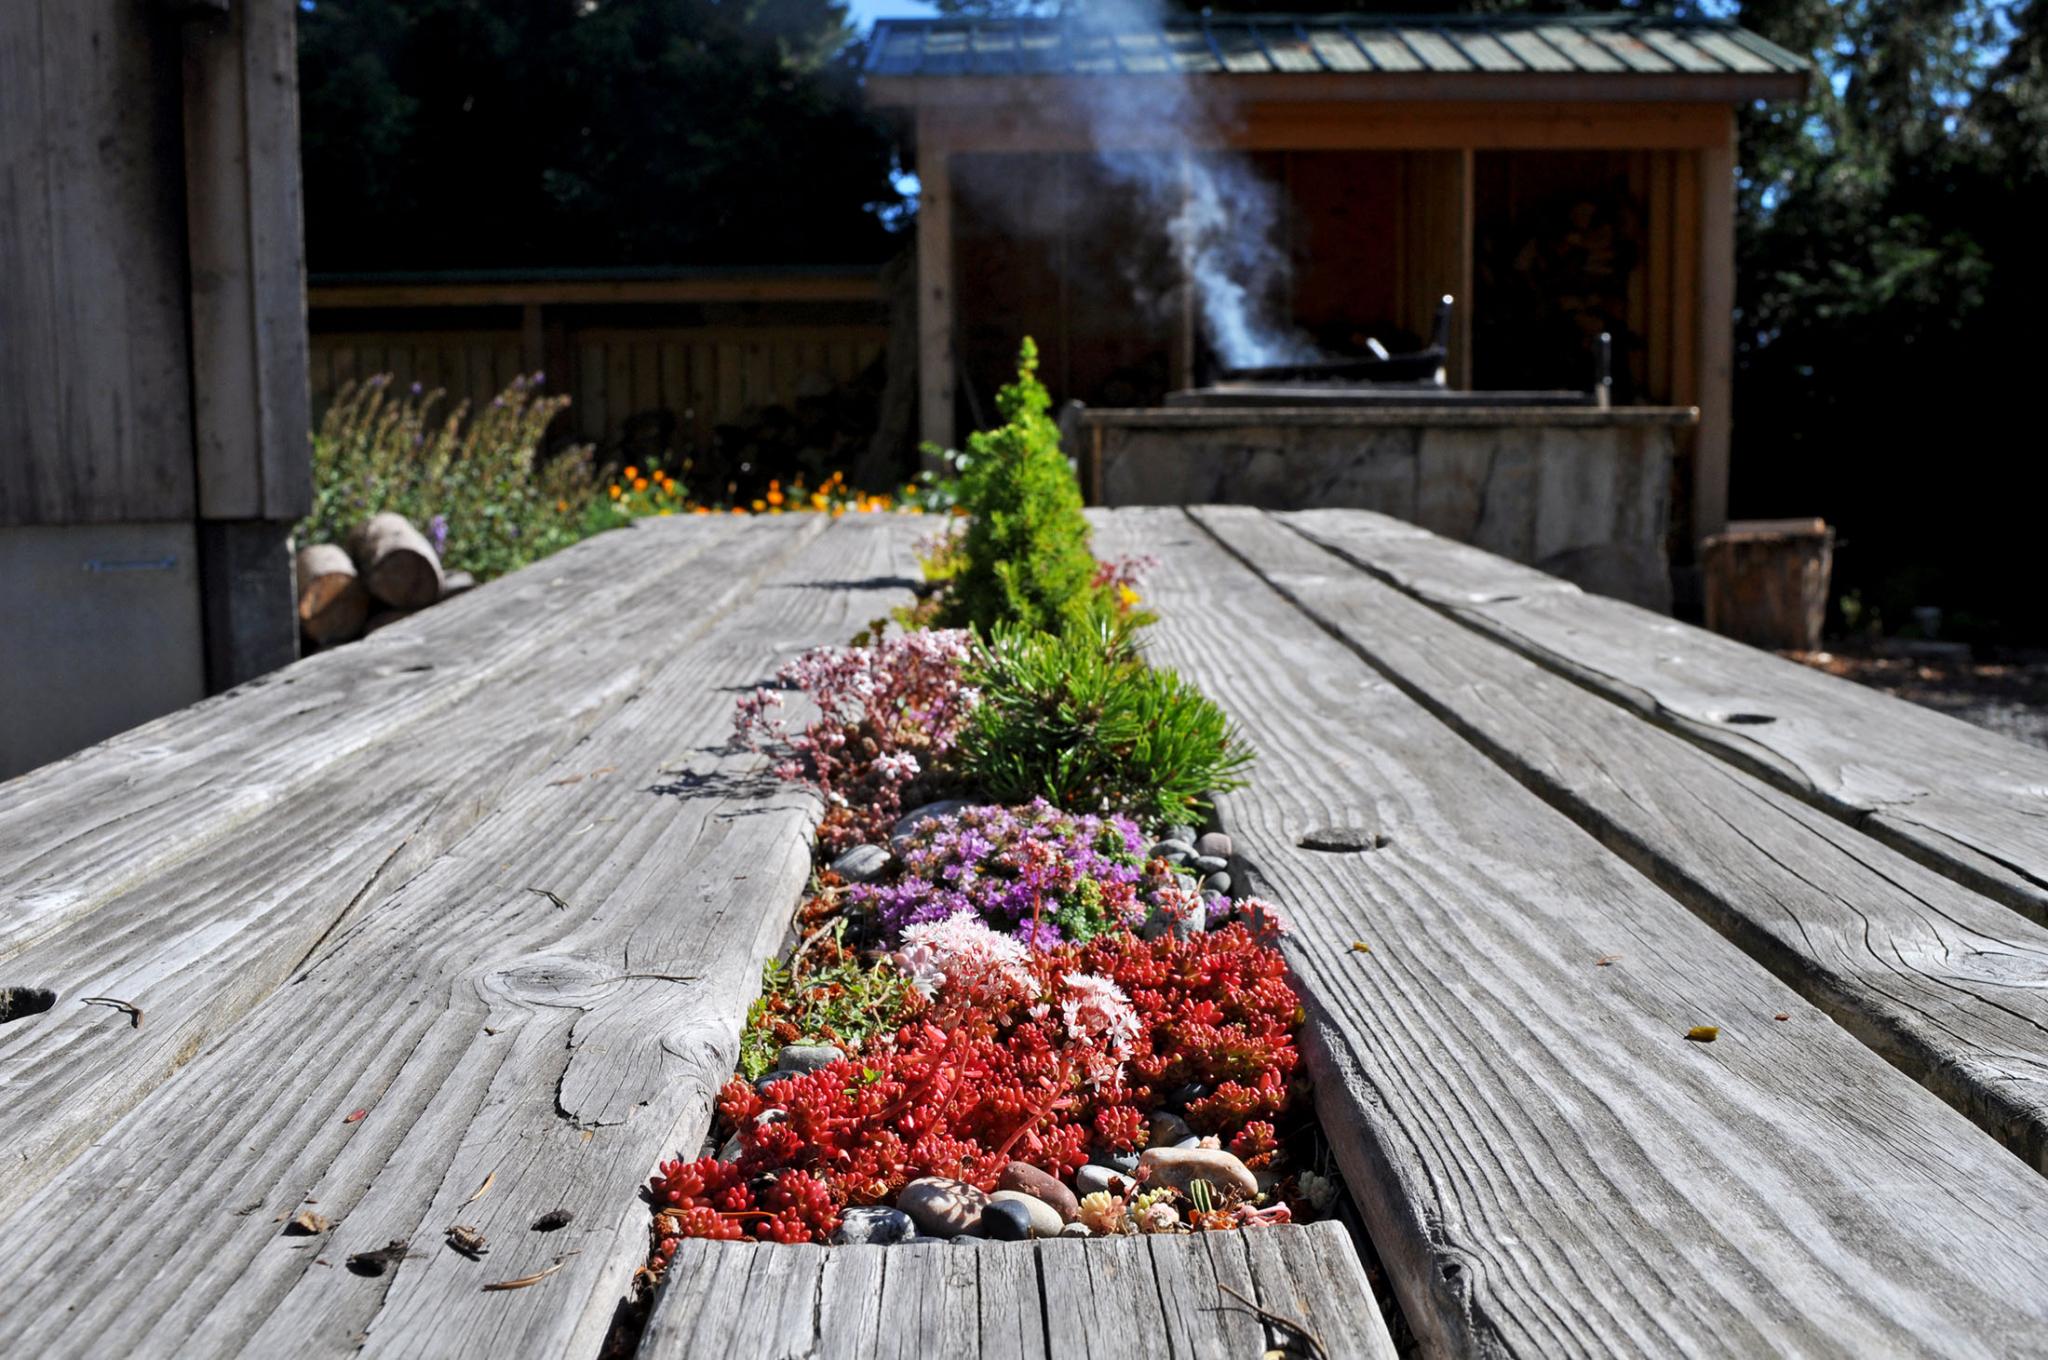 Smoking Food at Willows Inn Restaurant - Environmental Storytelling